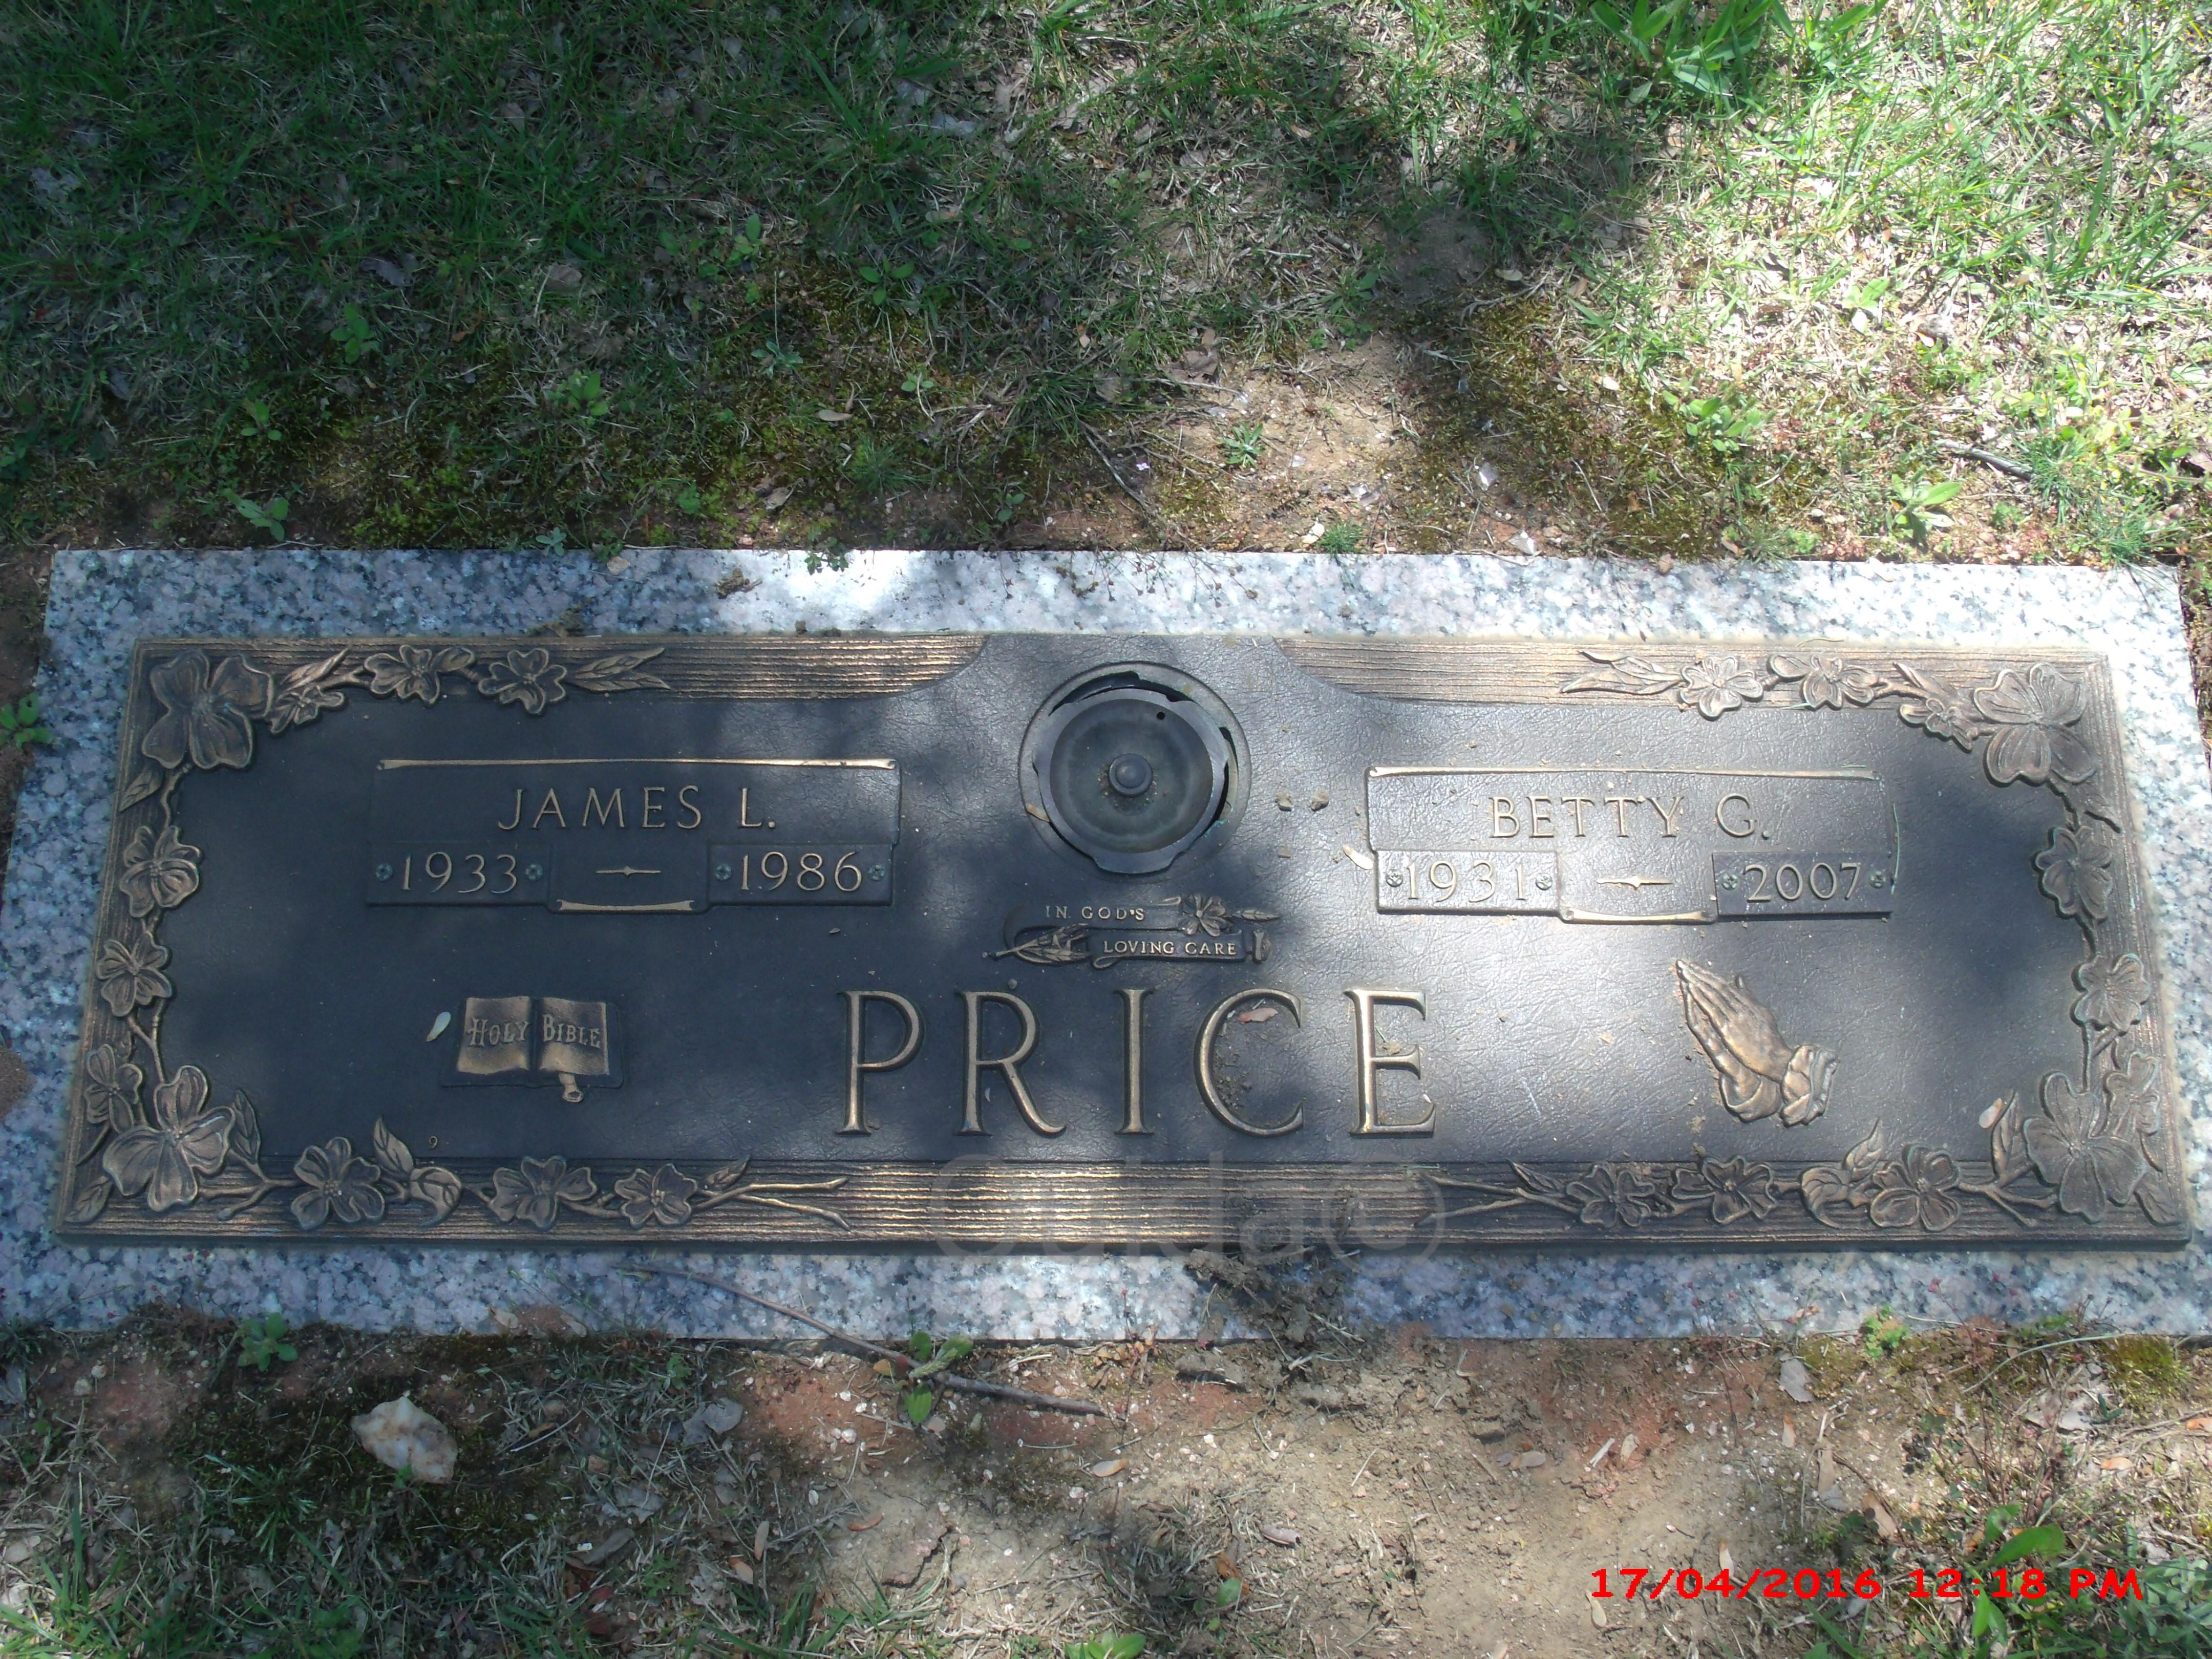 James Lee Price